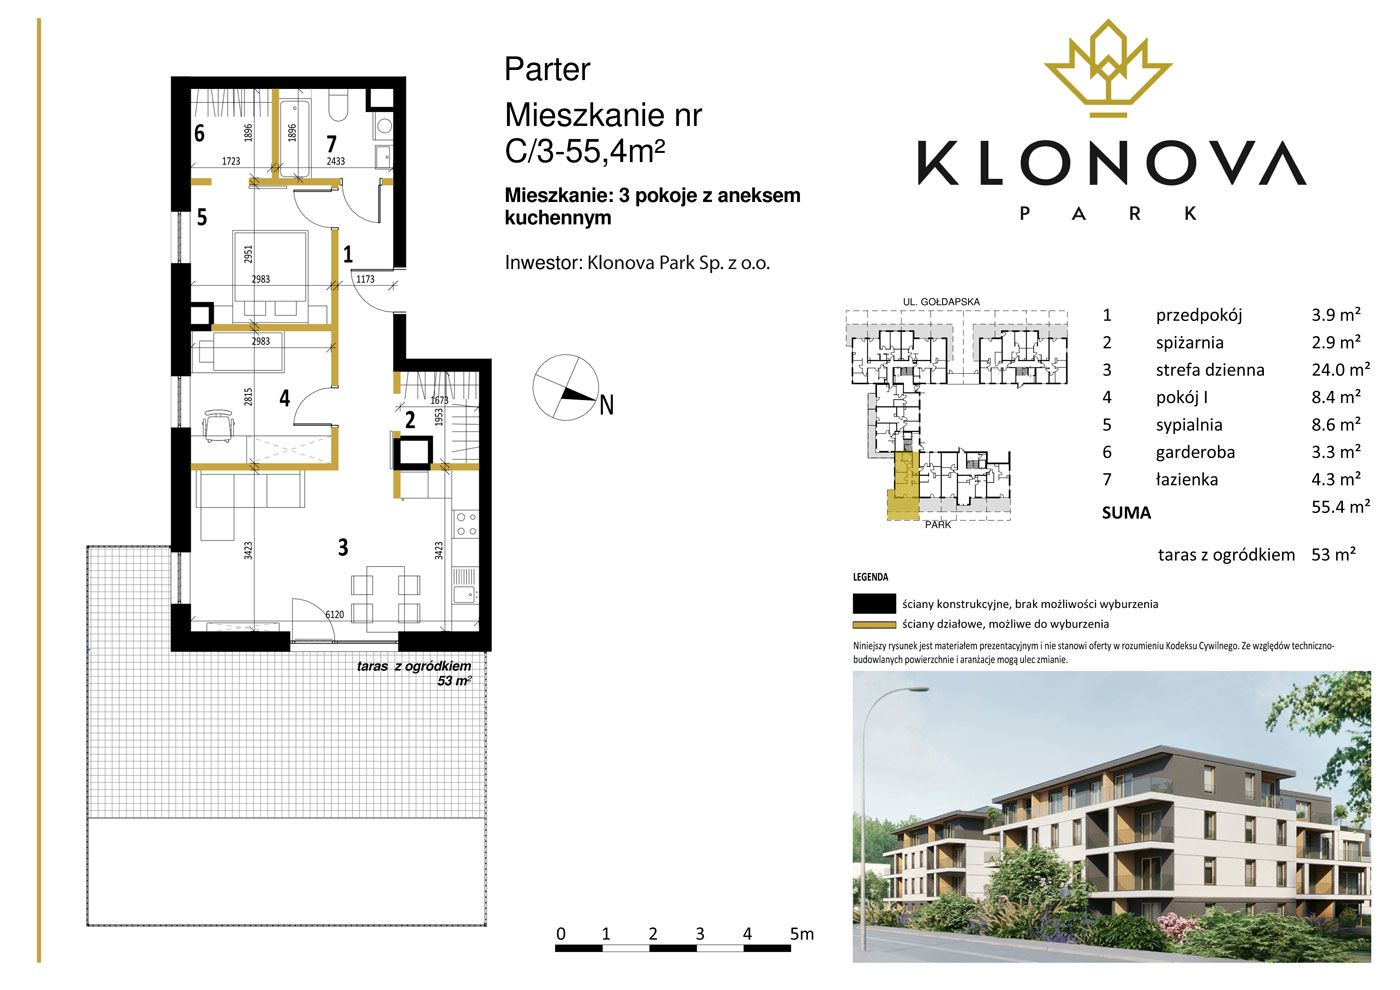 Apartamenty Klonova Park - Plan mieszkania C/3